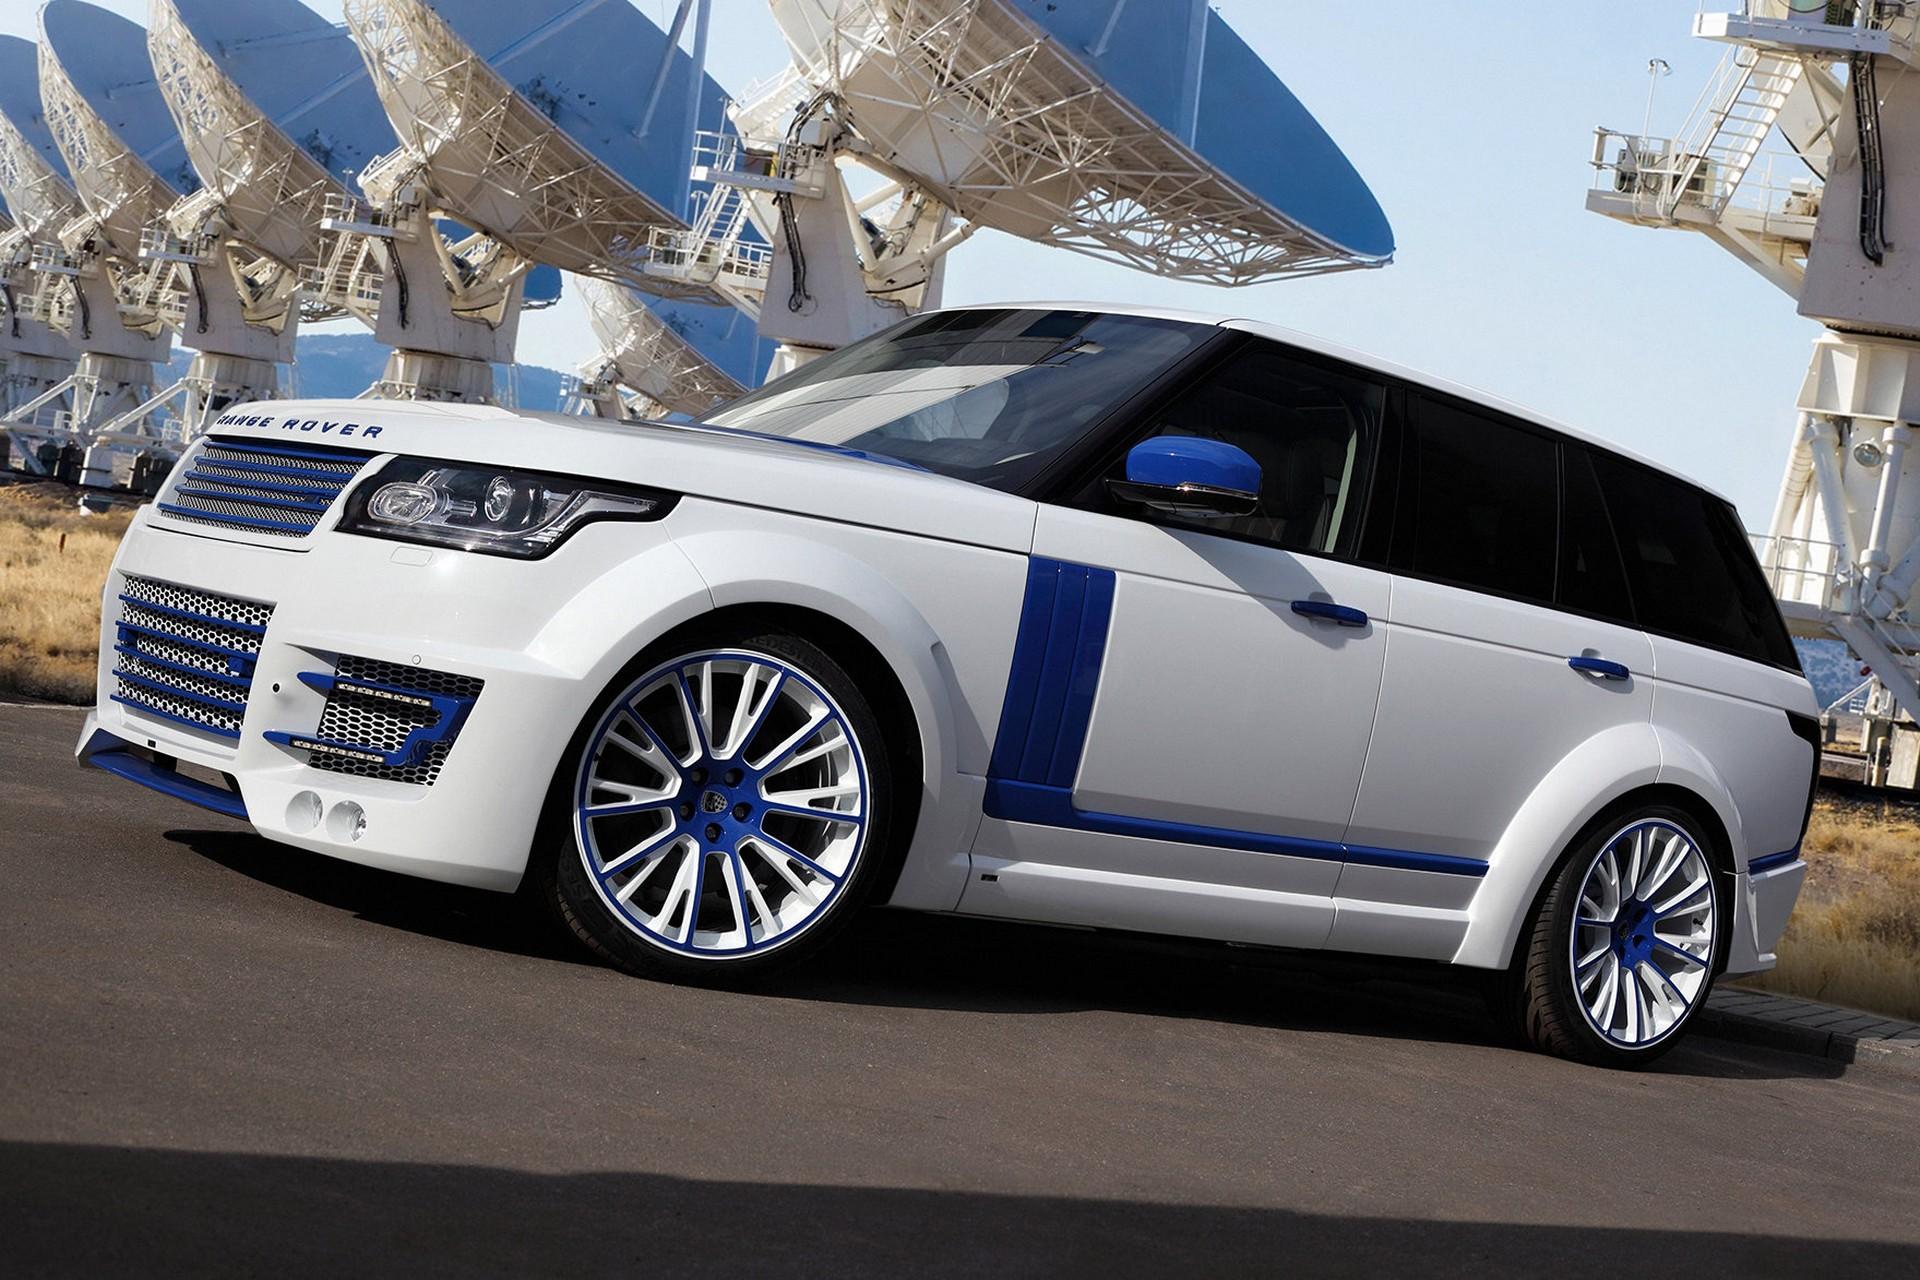 Range Rover Lumma Clr R White And Blue Topcar